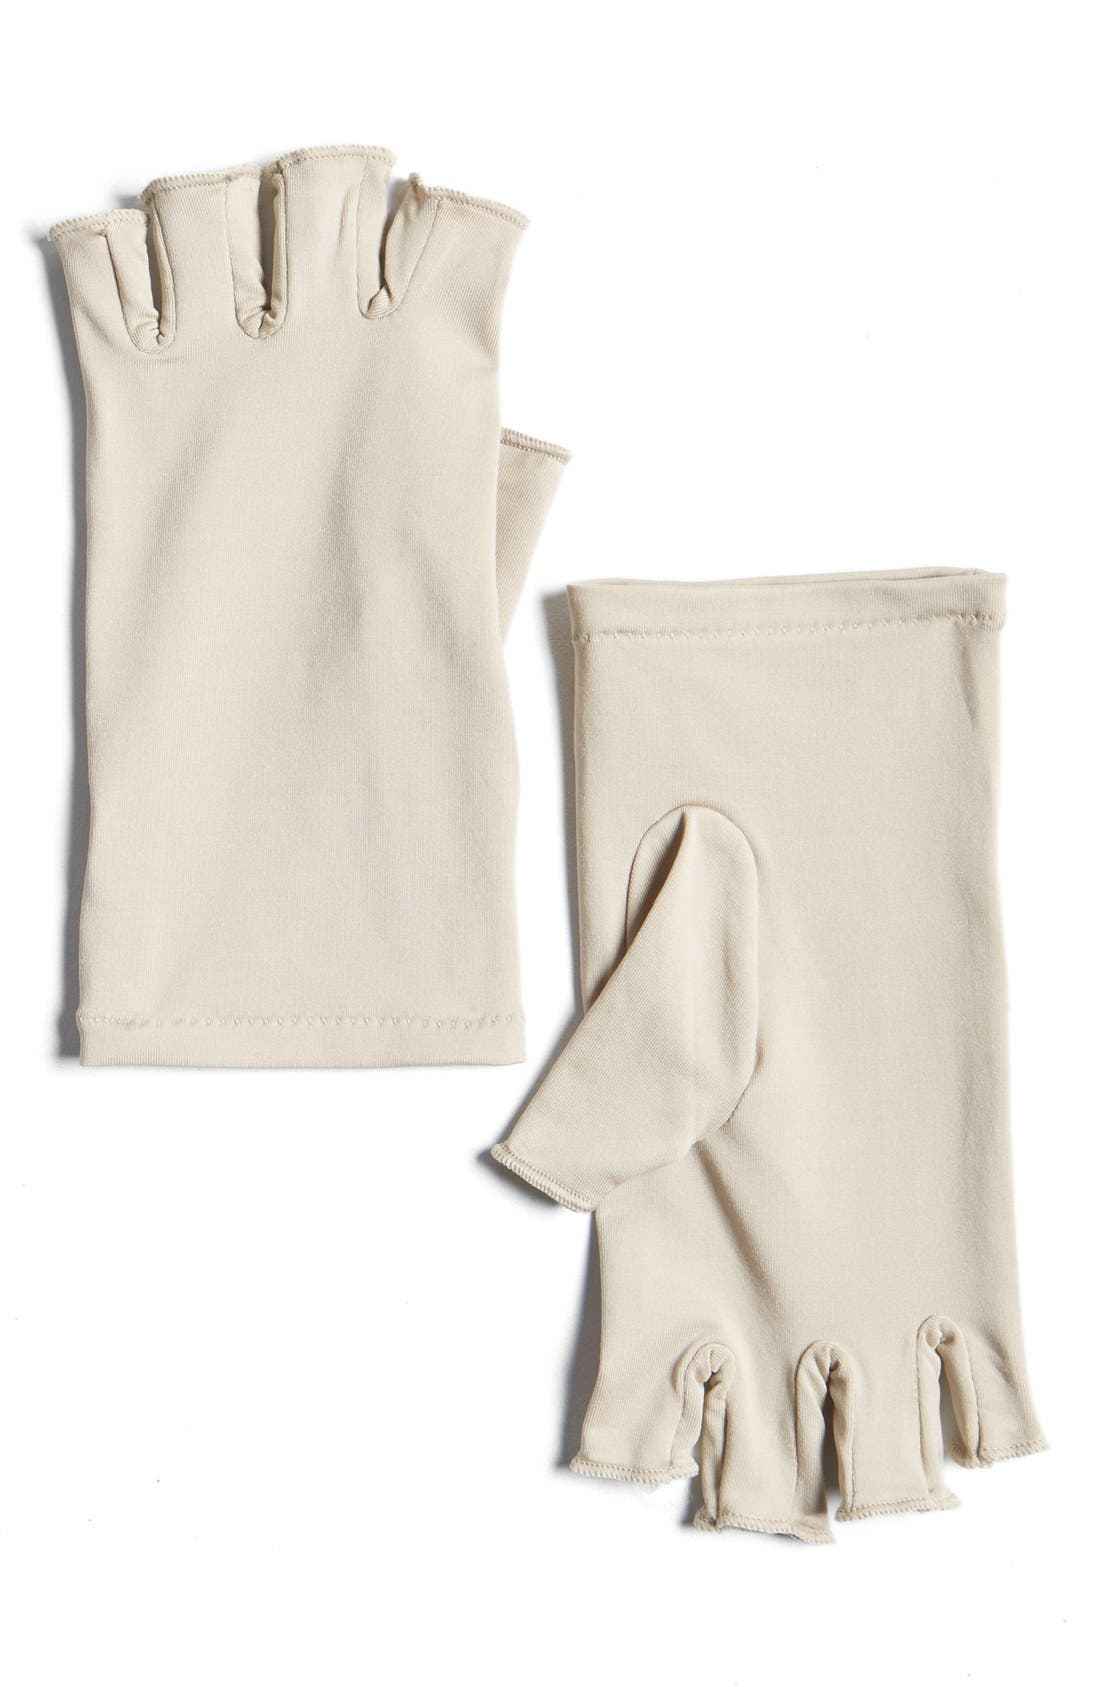 Skin Rejuvenating Gloves,                         Main,                         color, 000